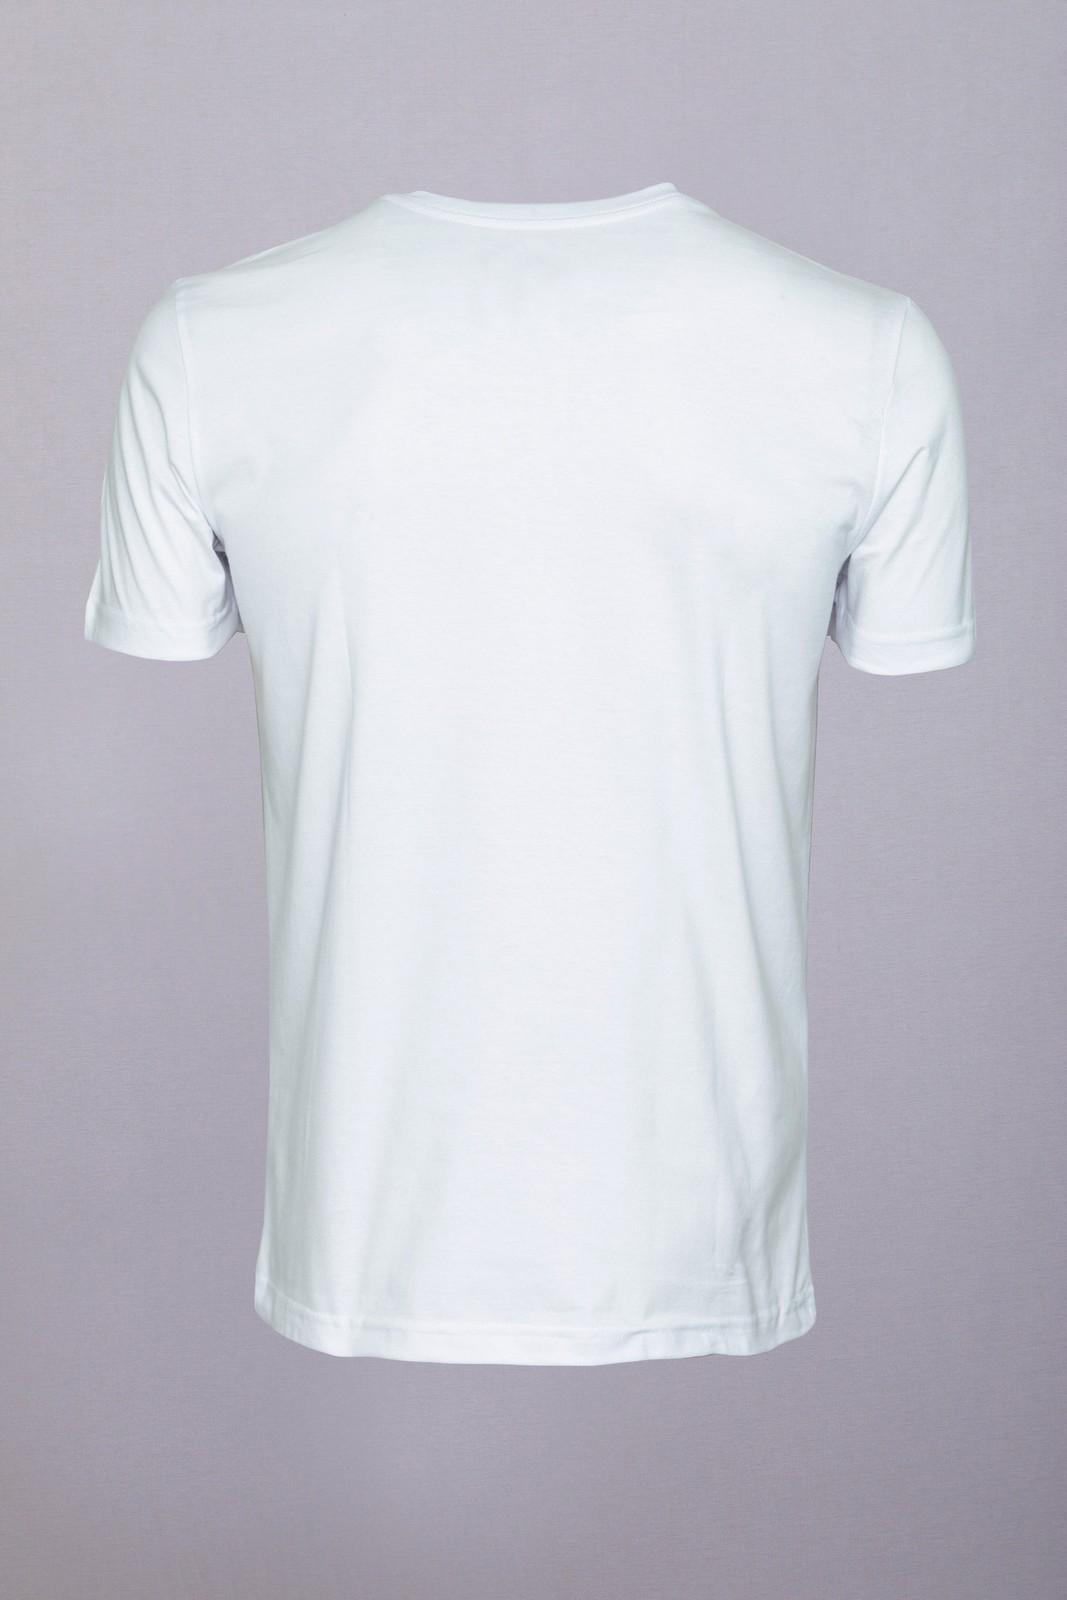 Camiseta CoolWave Coconut Beach Branca